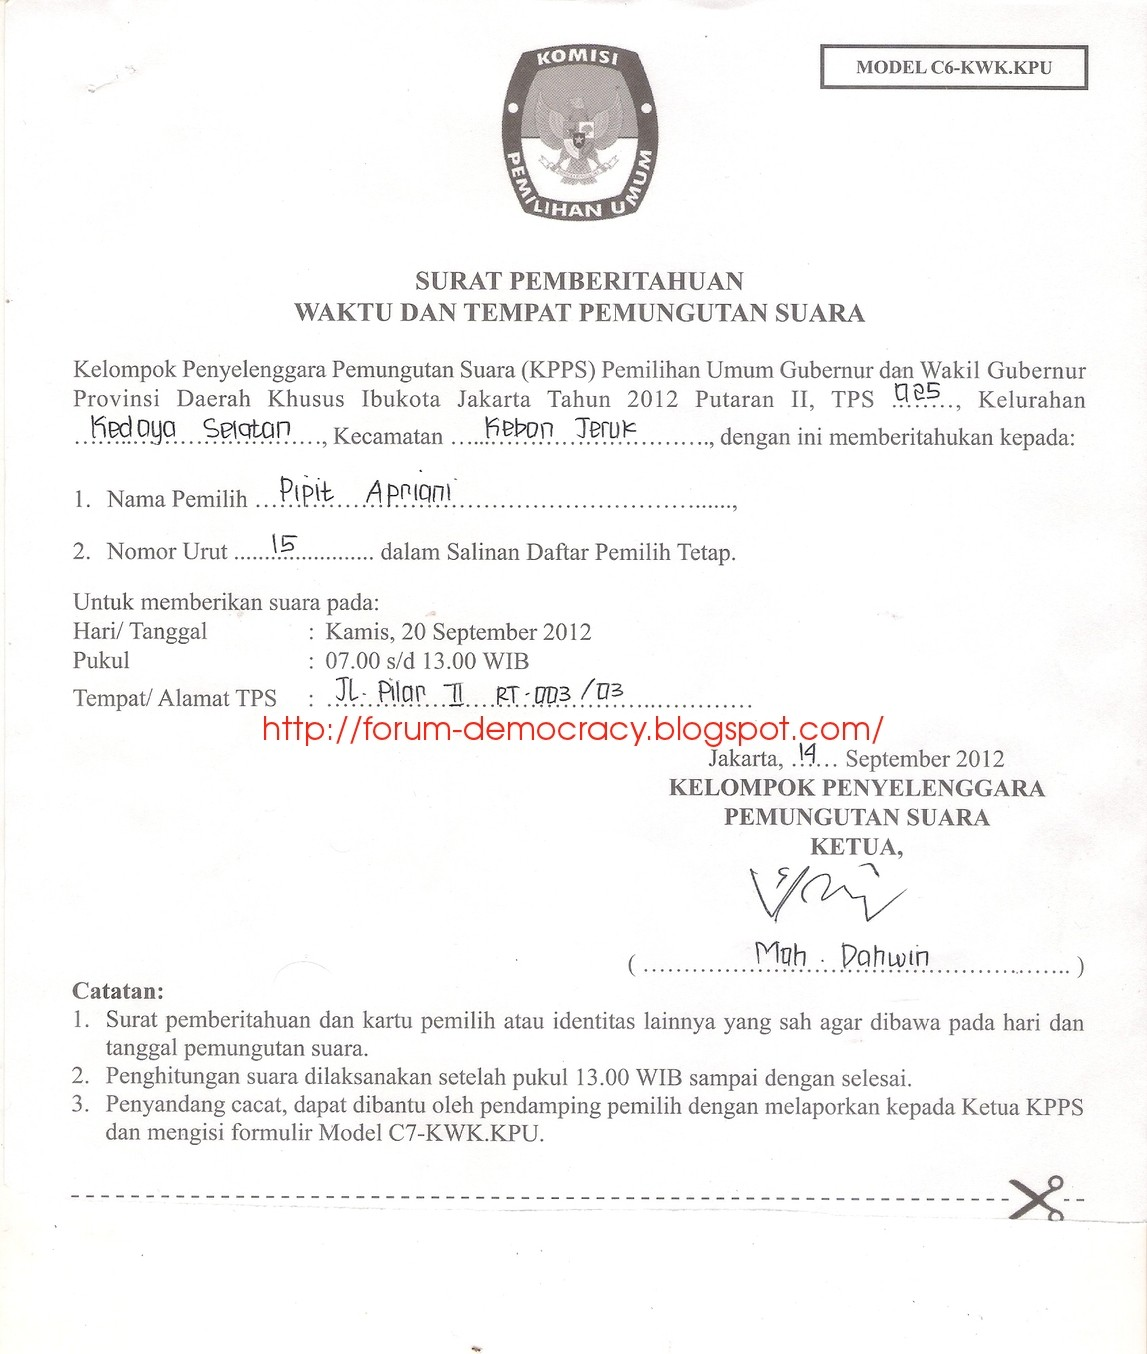 Press Release Gubernatorial Election Of Dki Jakarta Second Round